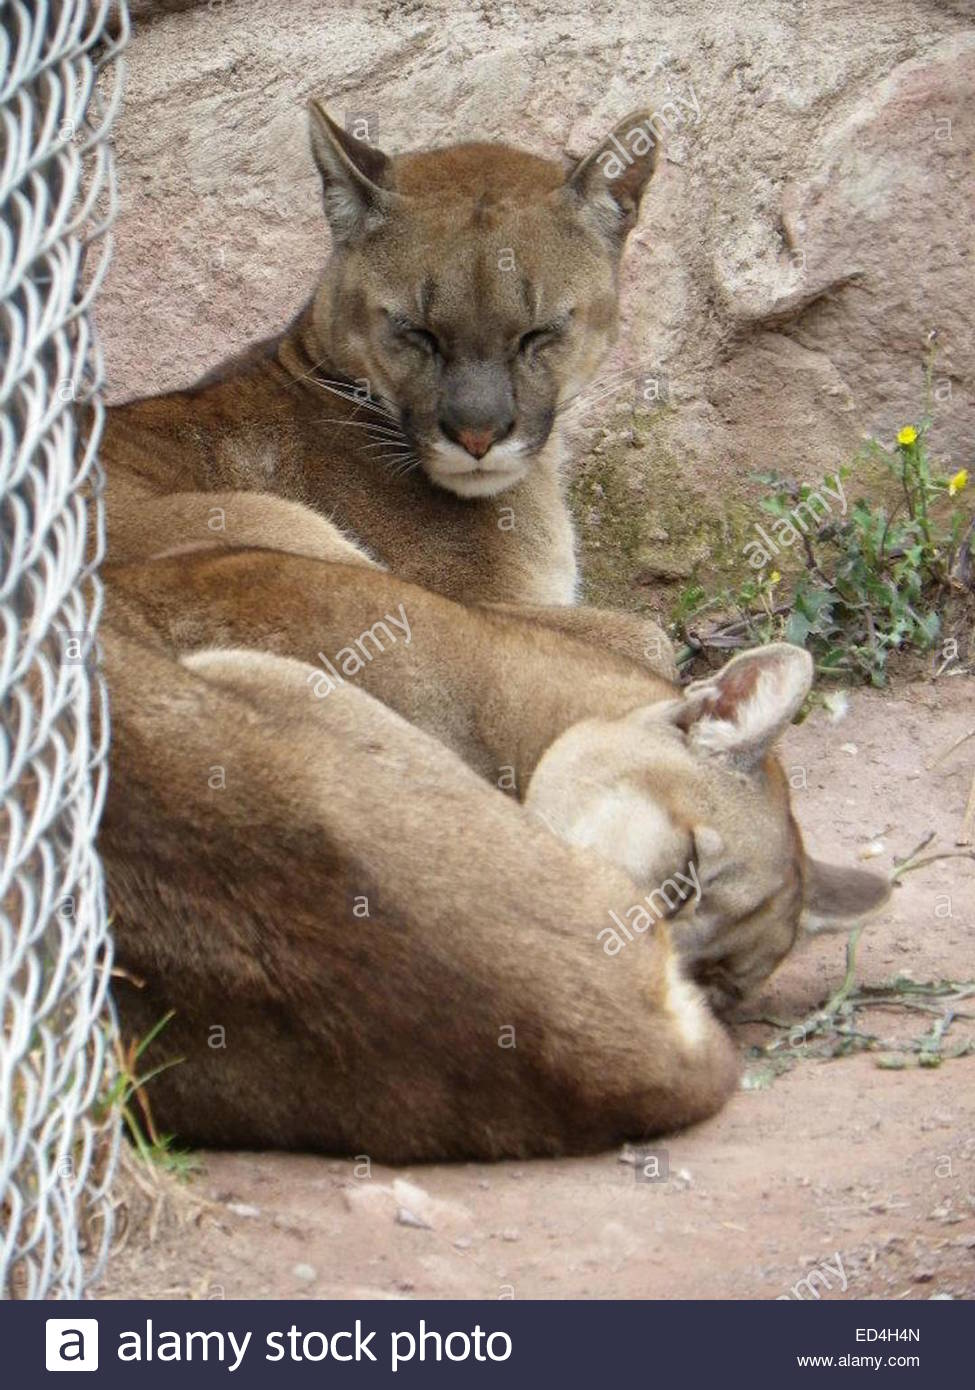 Mountain living near cusco peru royalty free stock photo - Puma Puma Concolor At An Animal Sanctuary Near Cusco Peru